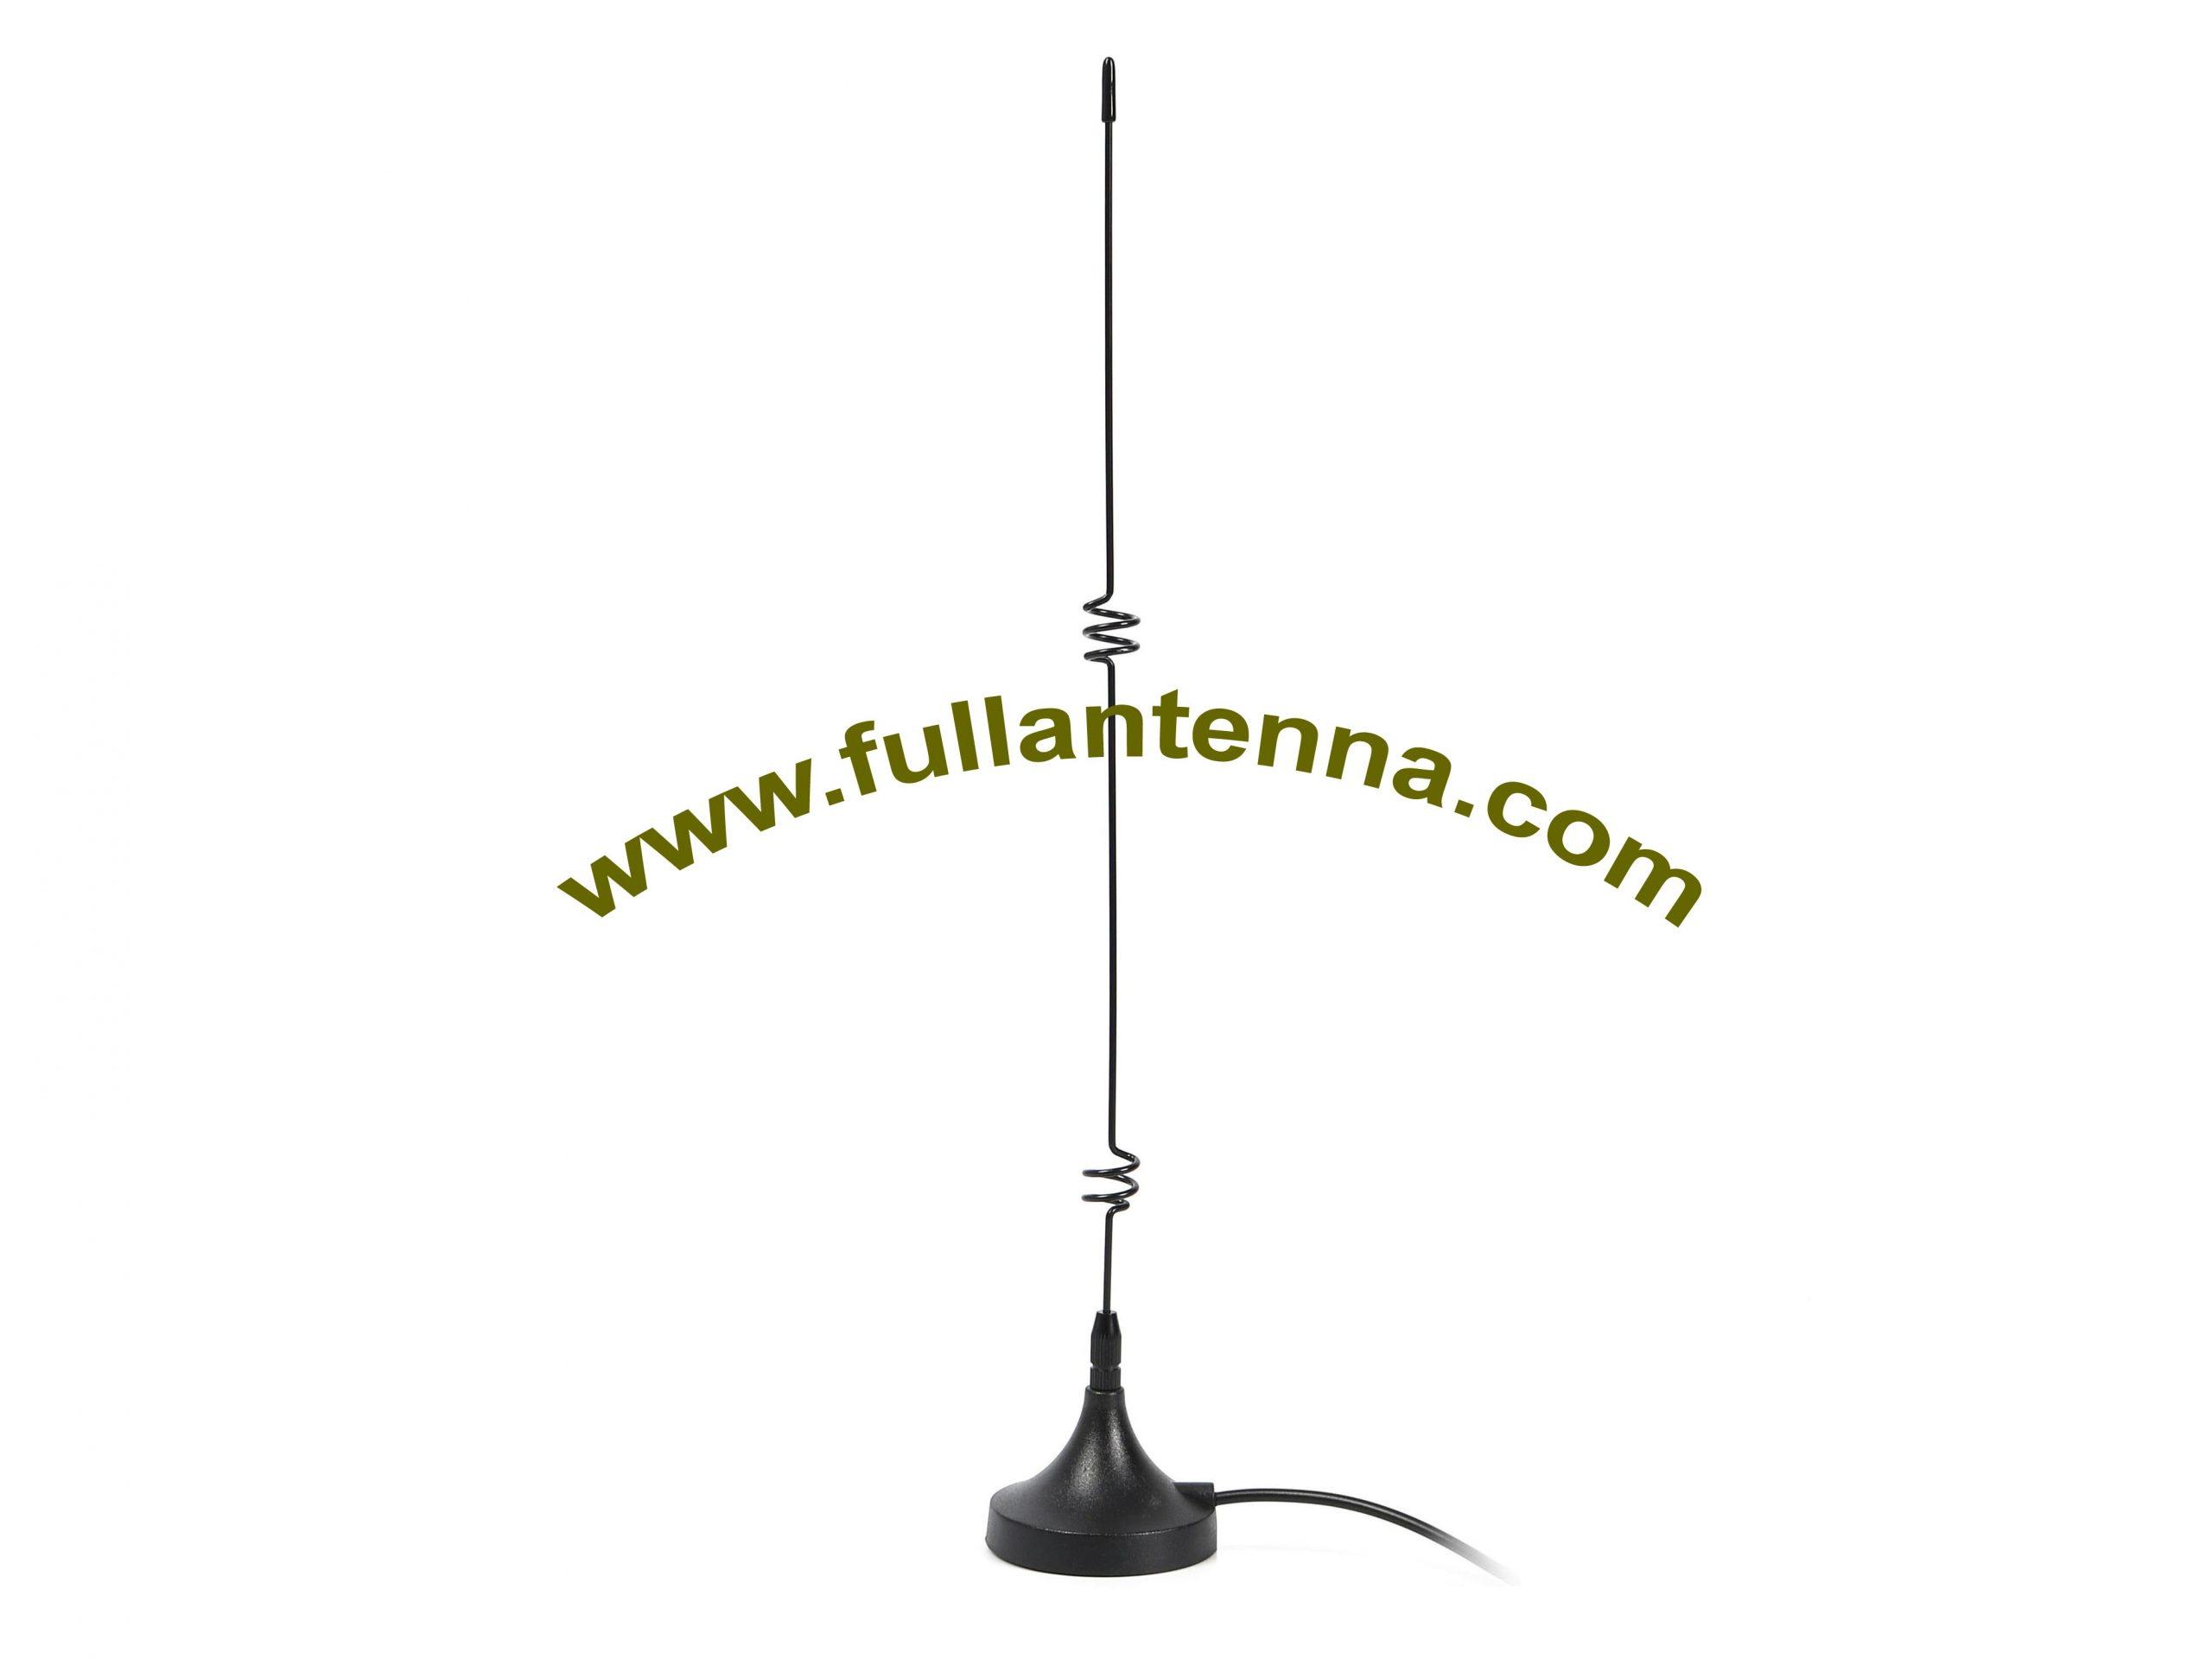 P/N:FAGSM.06,GSM External Antenna,hot sale high gain 7dbi 45mm base SMA male